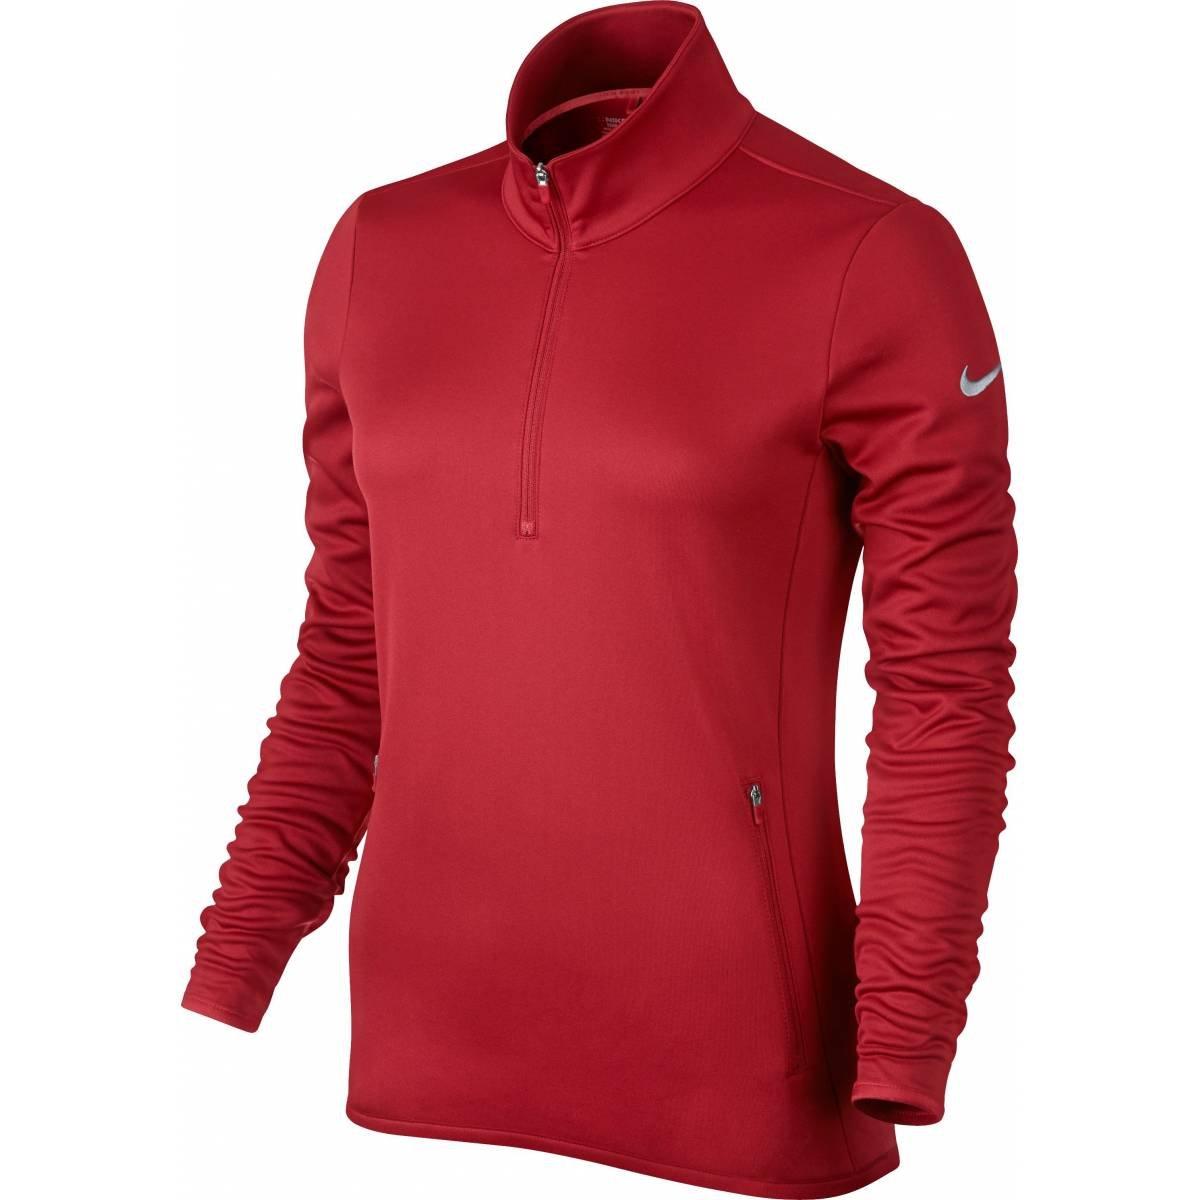 Nike Thermal 1/2 Zip Golf Pullover 2015 Ladies University Red XX-Large